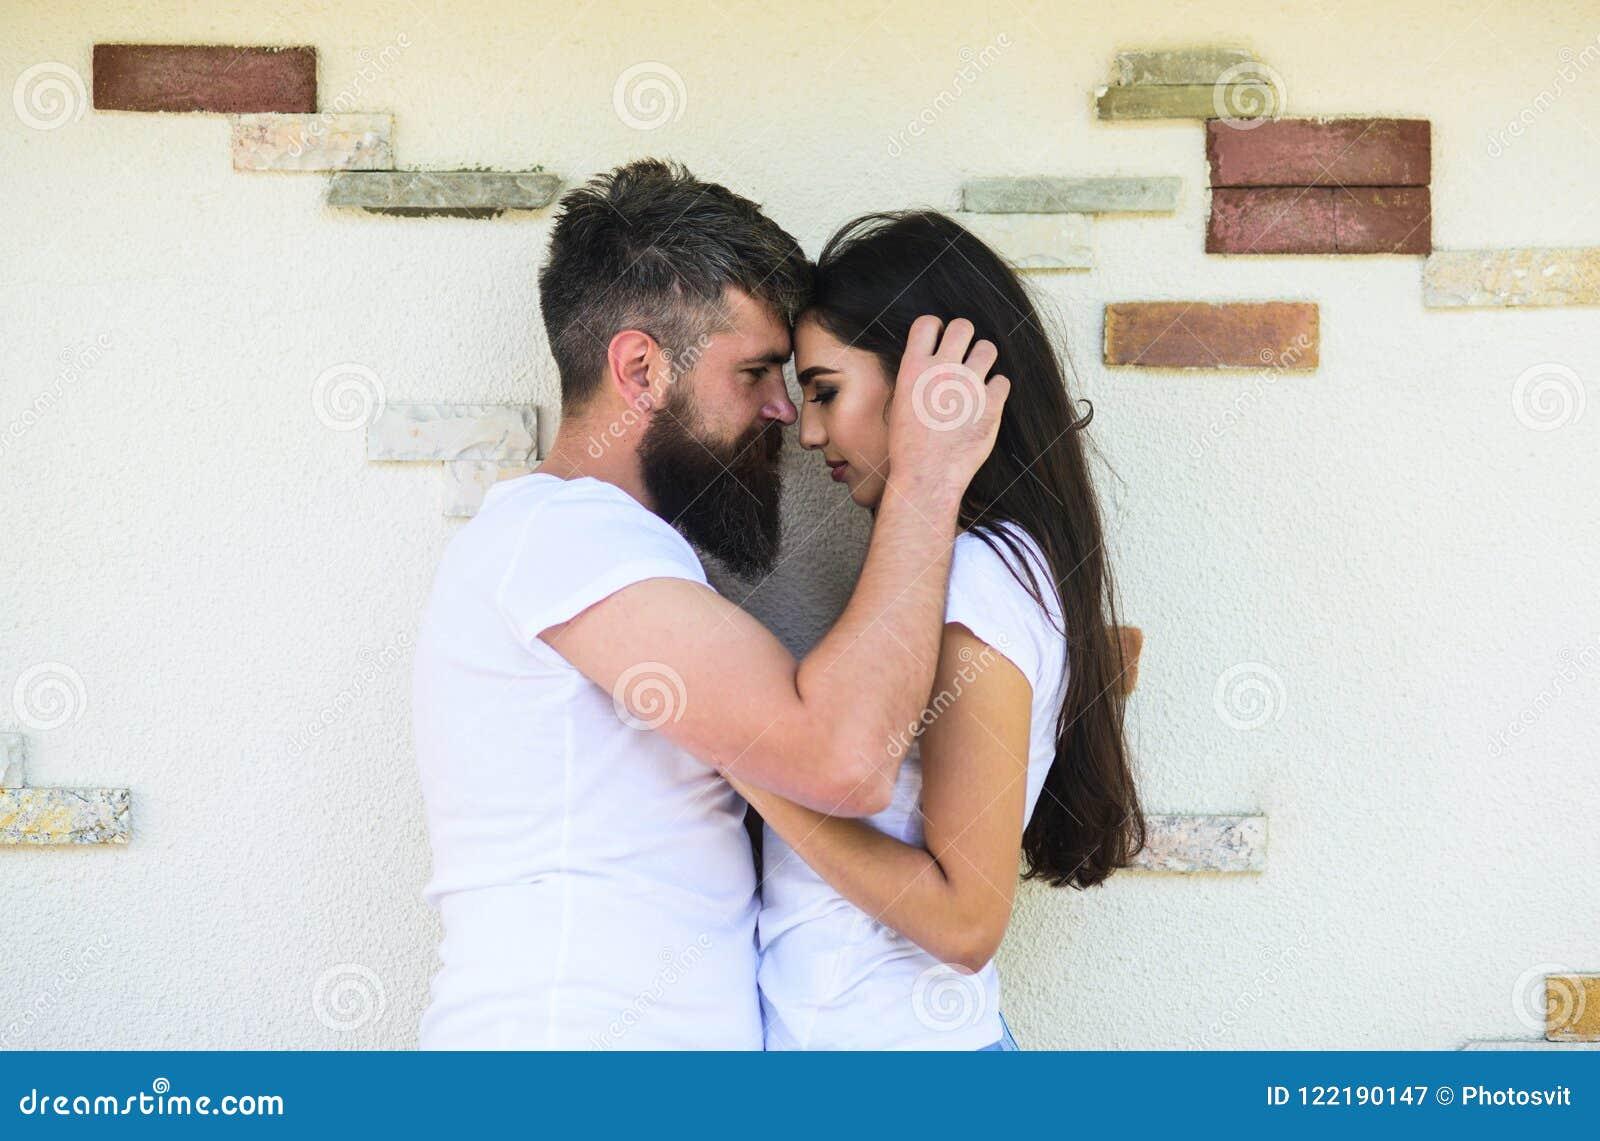 Cuddling dating site